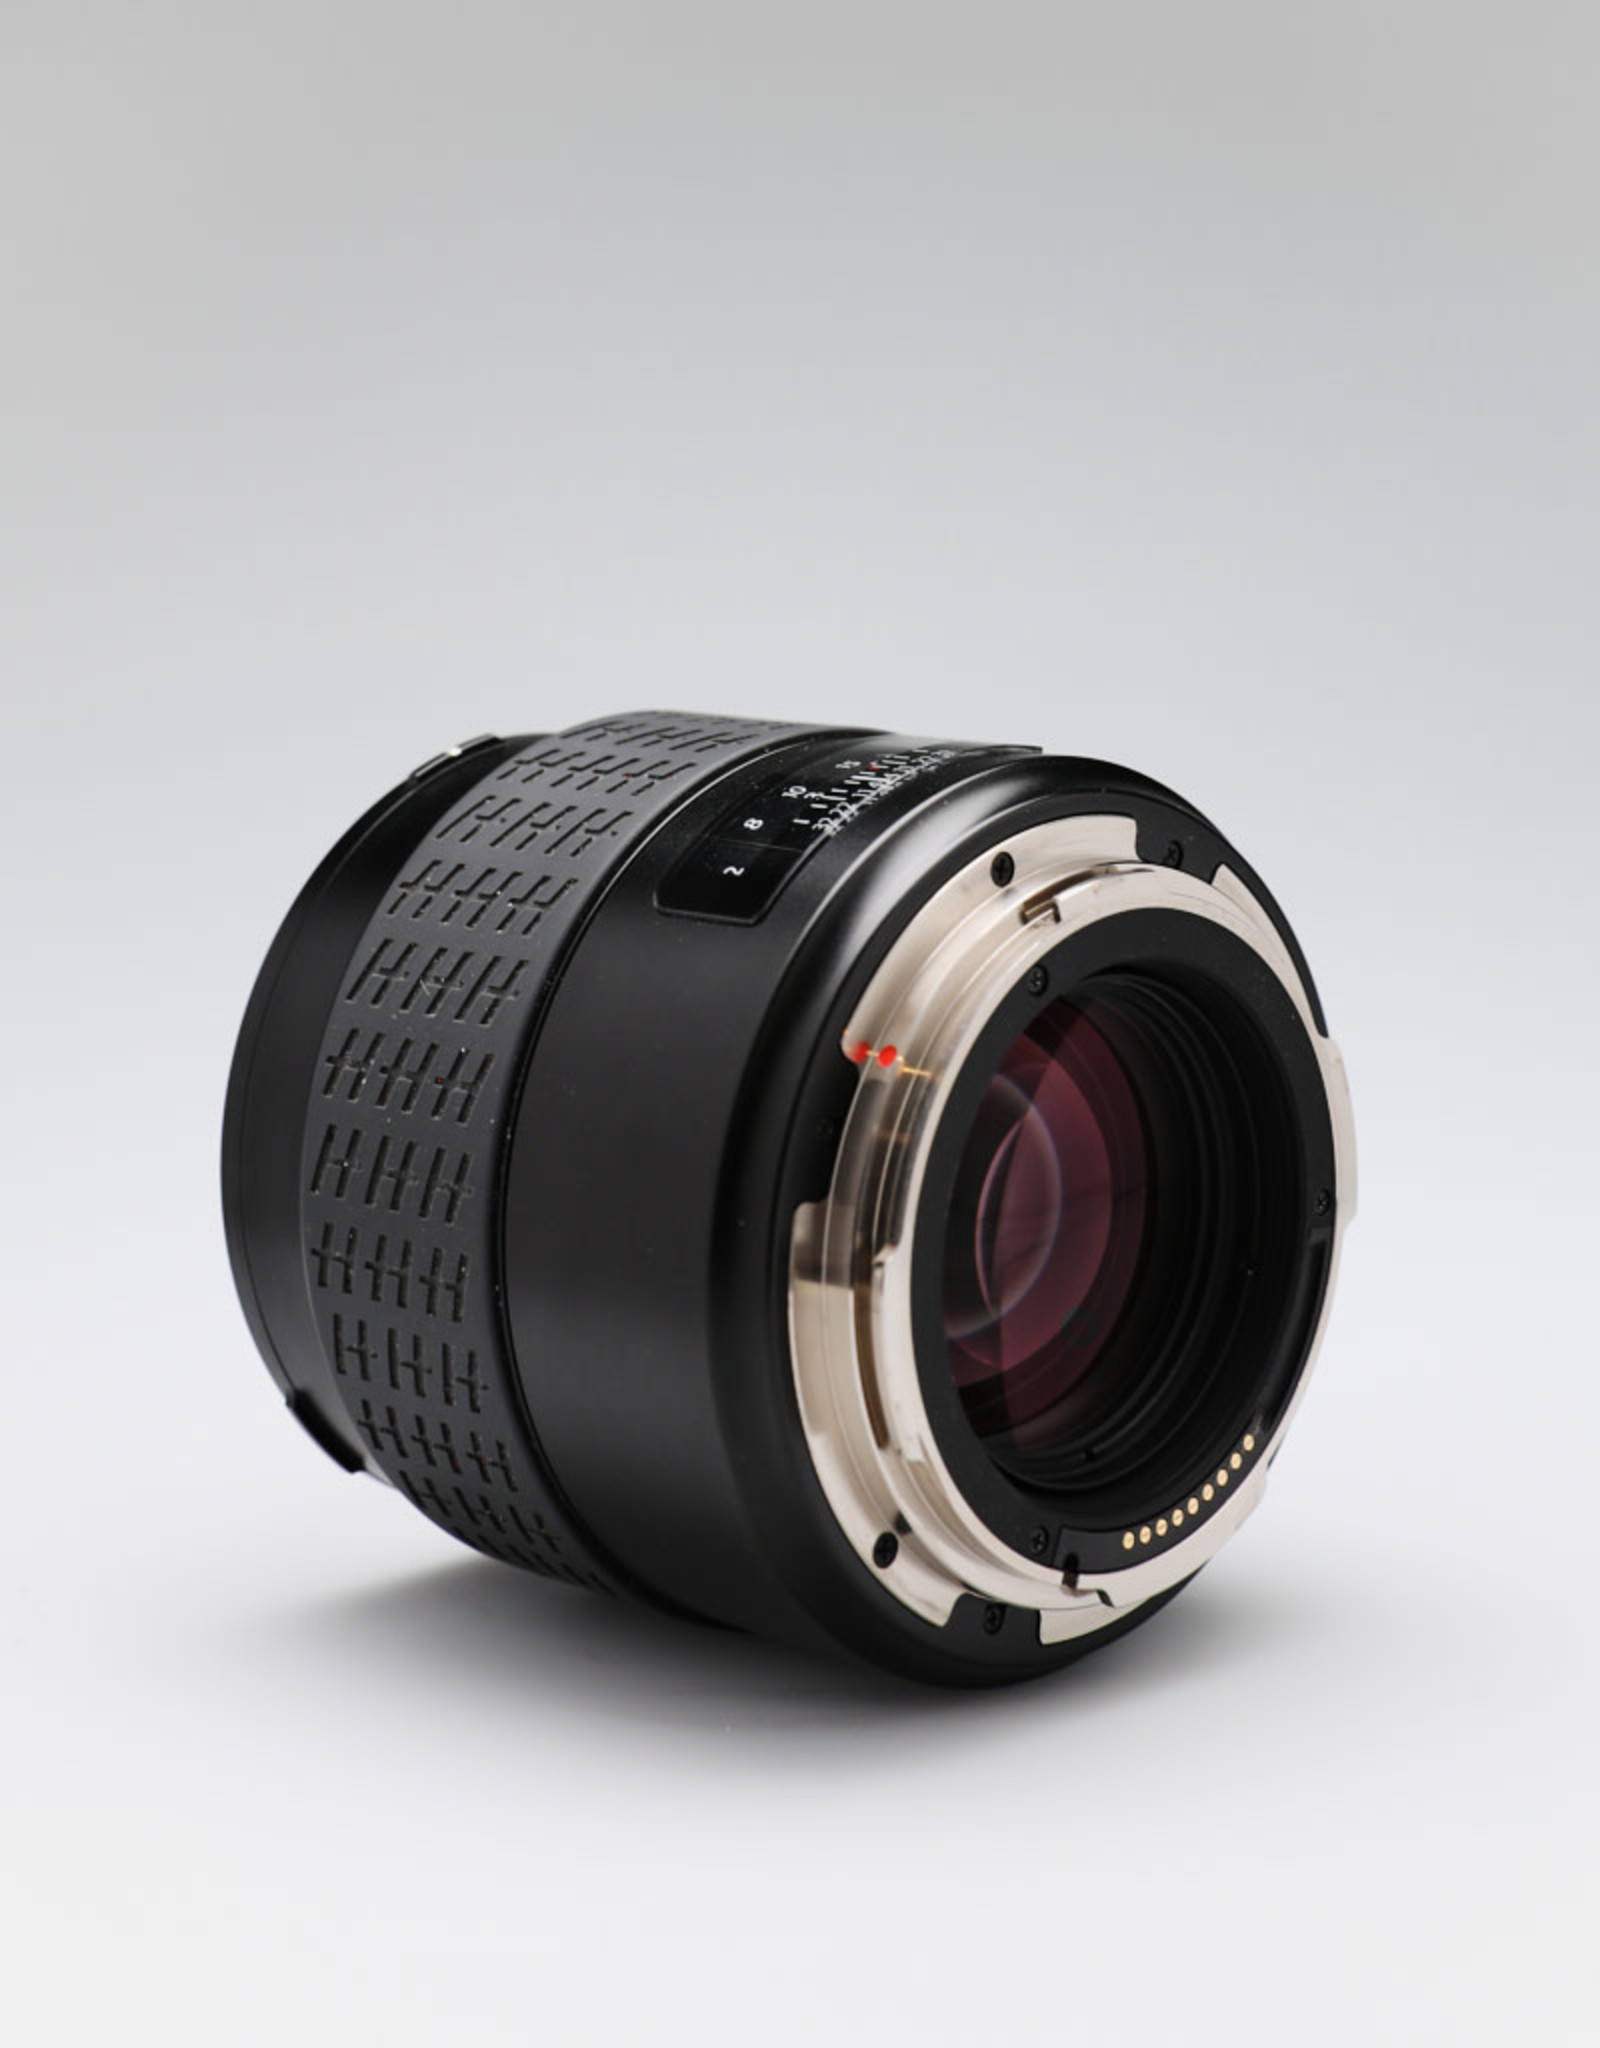 USED  Hasselblad HC 100mm F2.2 Lens